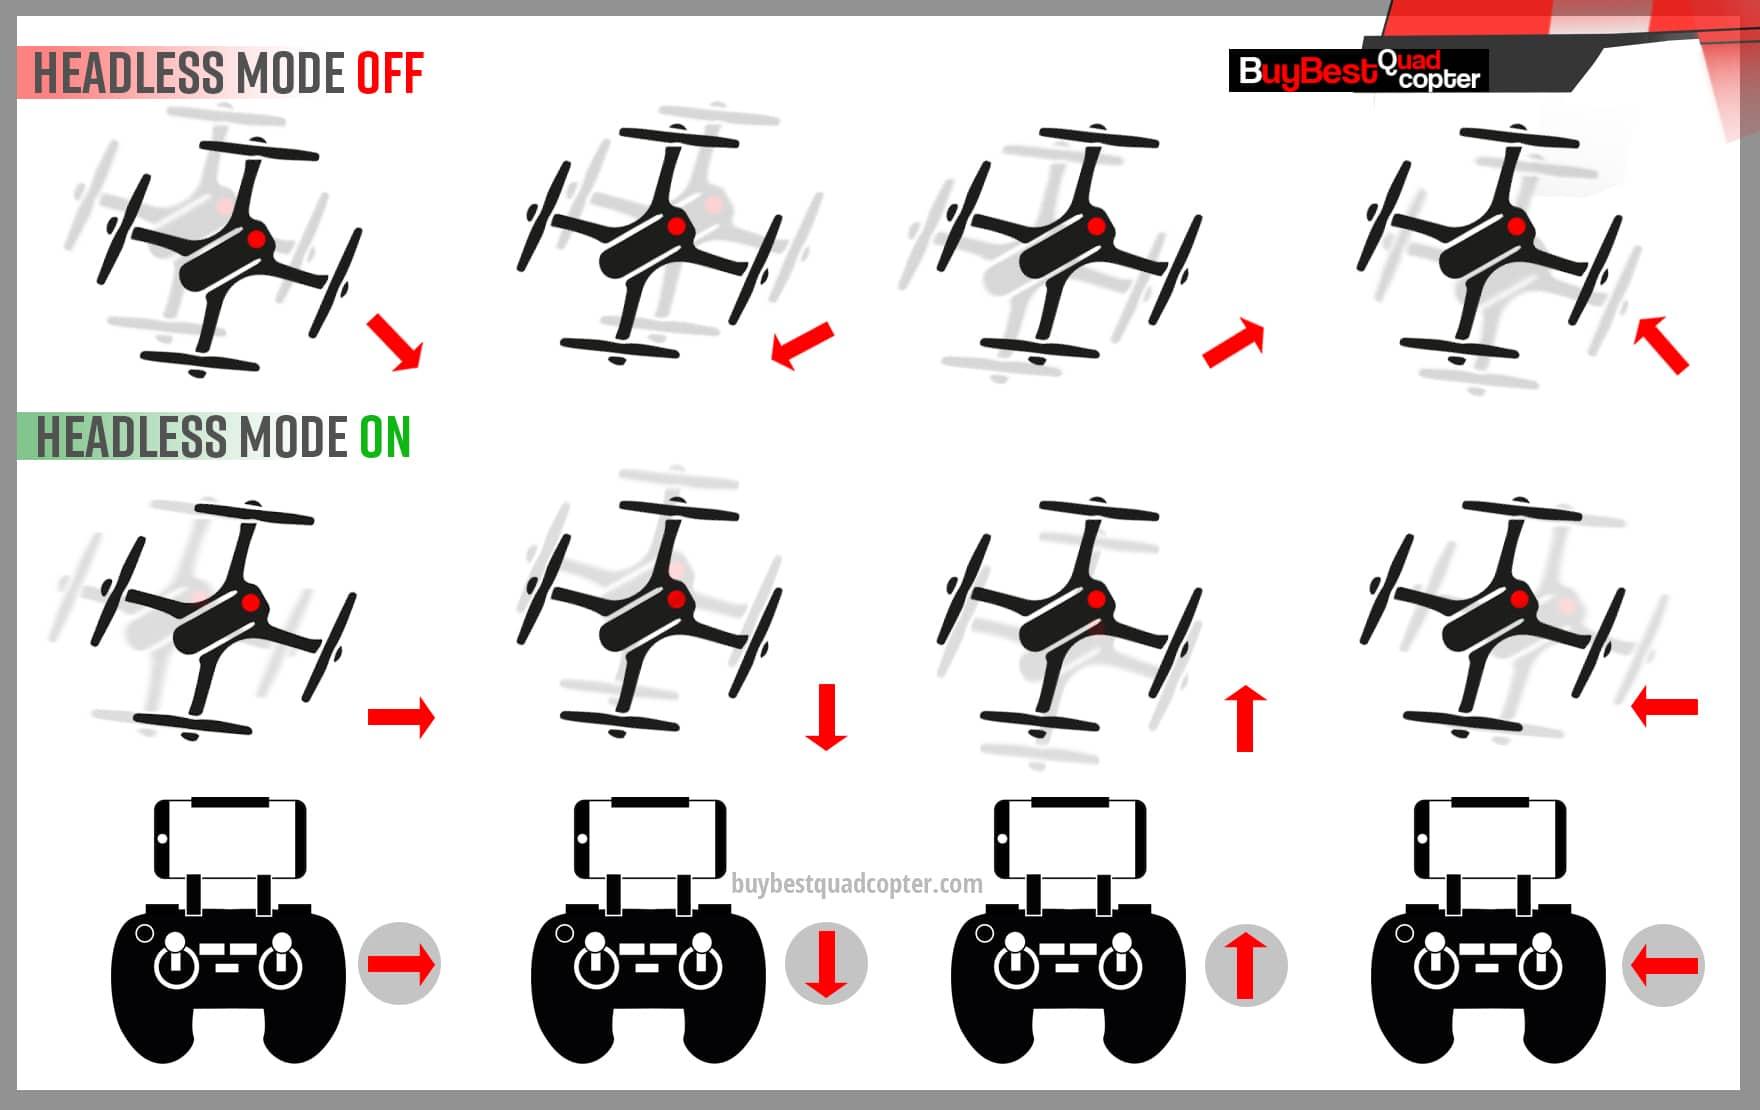 drone HEADLESS MODE